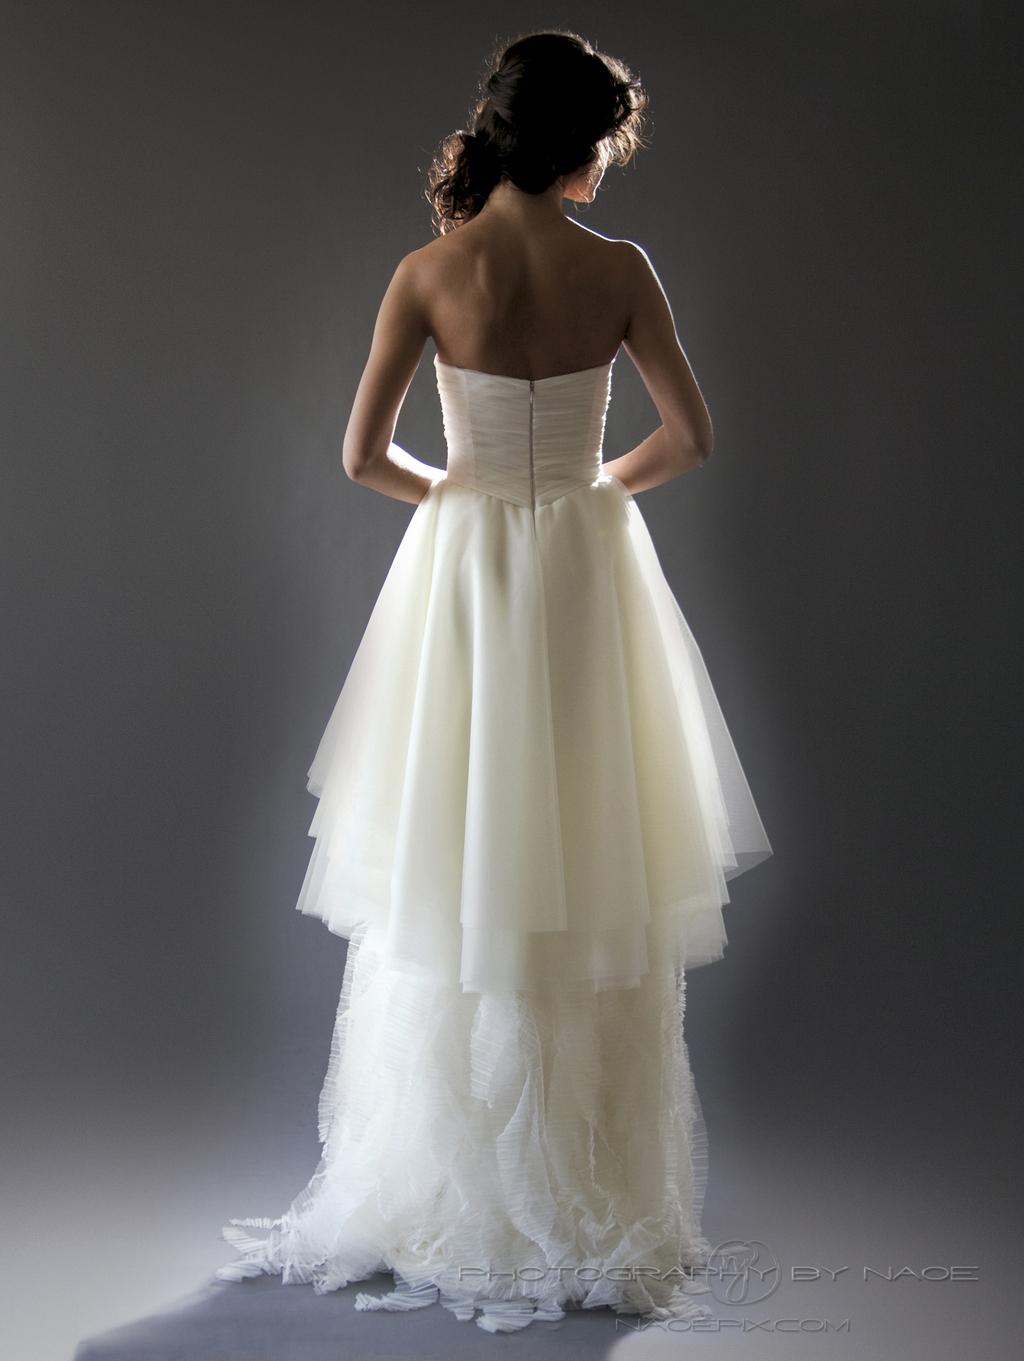 Wedding-dress-spring-2013-bridal_gown-cocoe-voci-1-_back.full